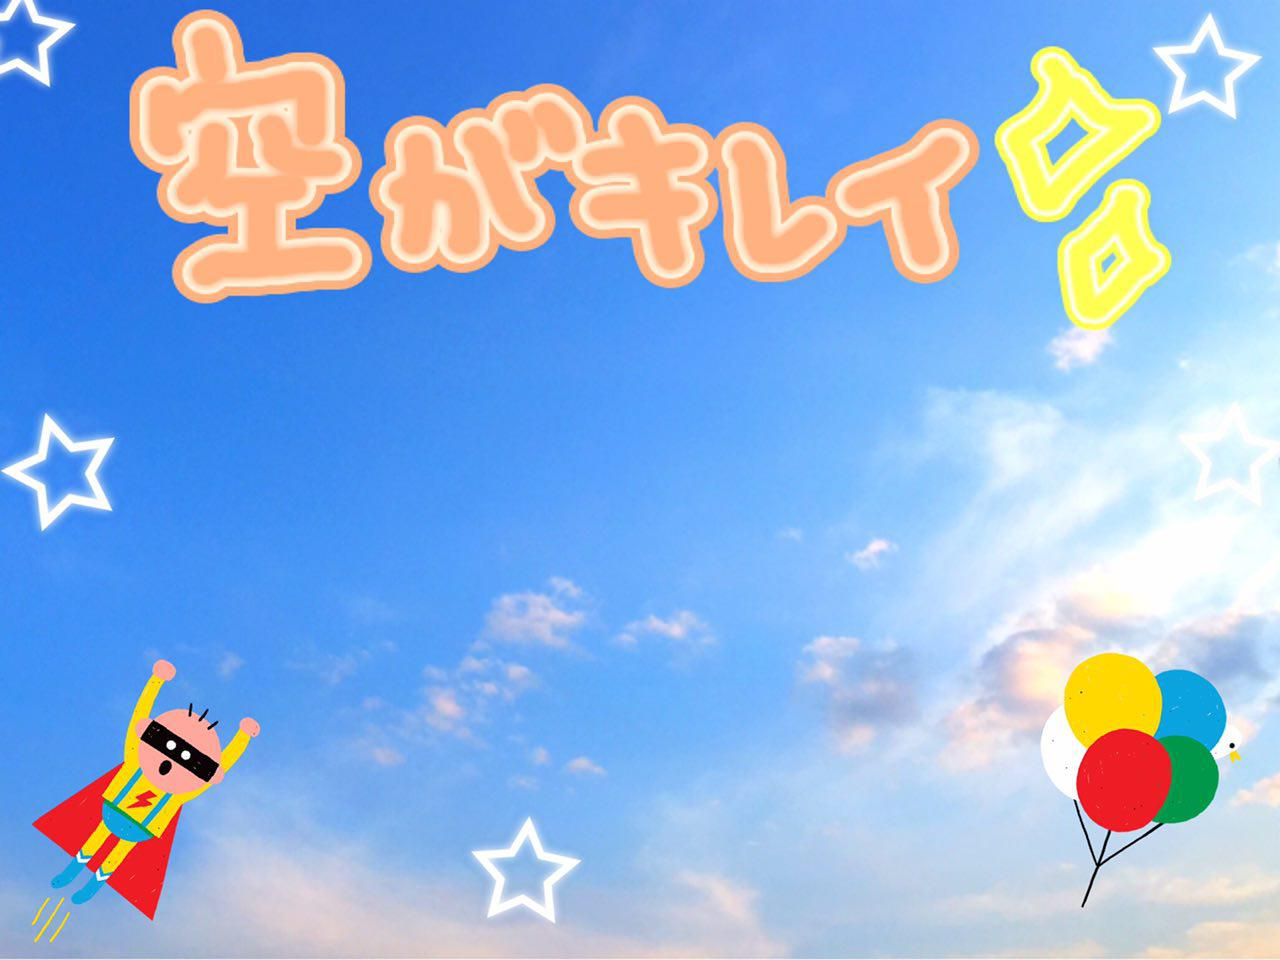 photo_2017-04-03_01-07-15.jpg